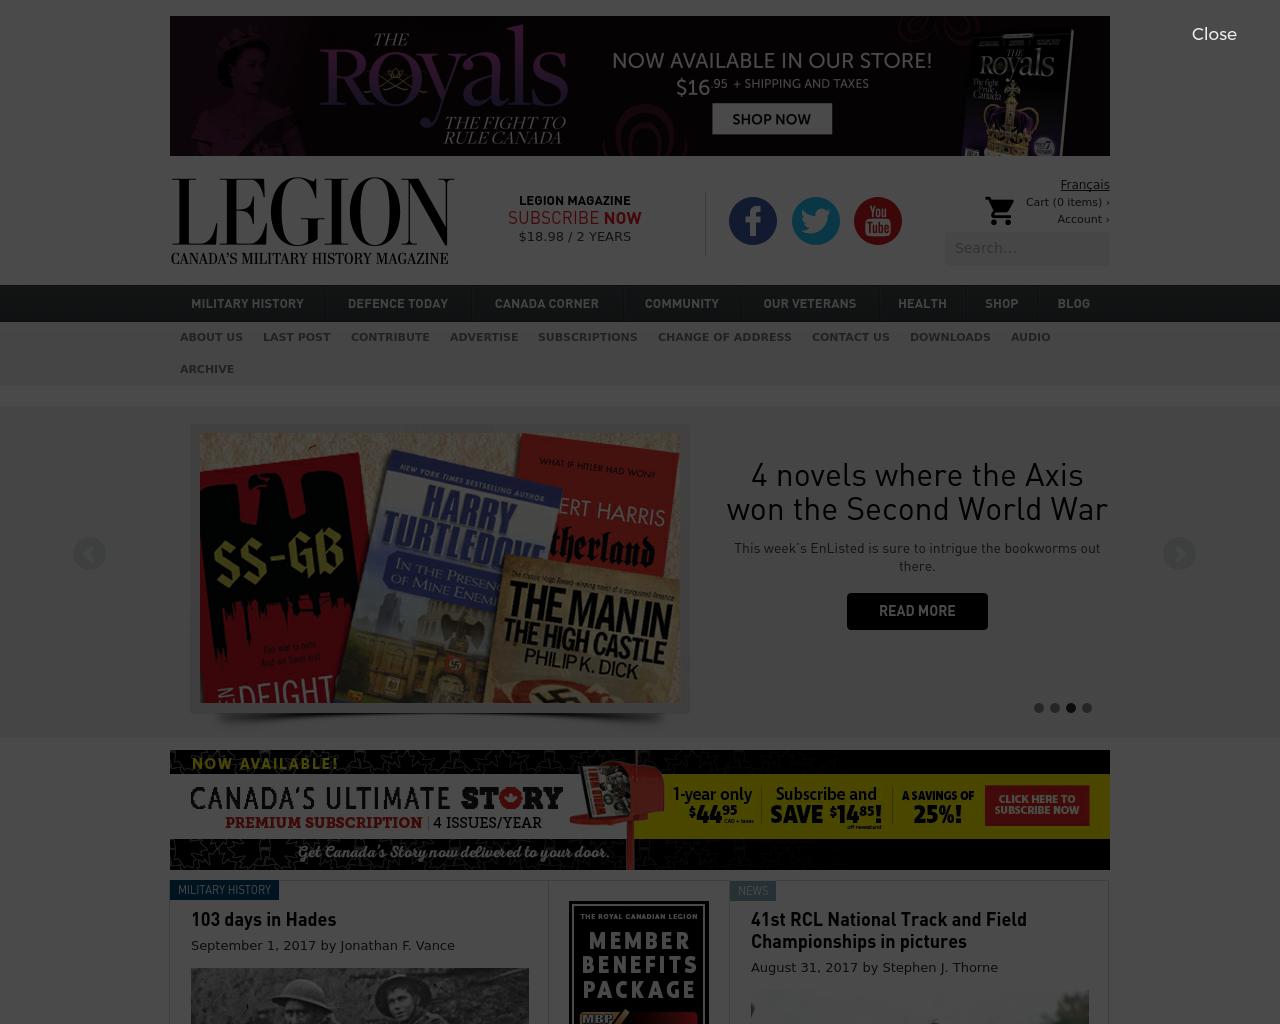 Legion-Magazine-Advertising-Reviews-Pricing